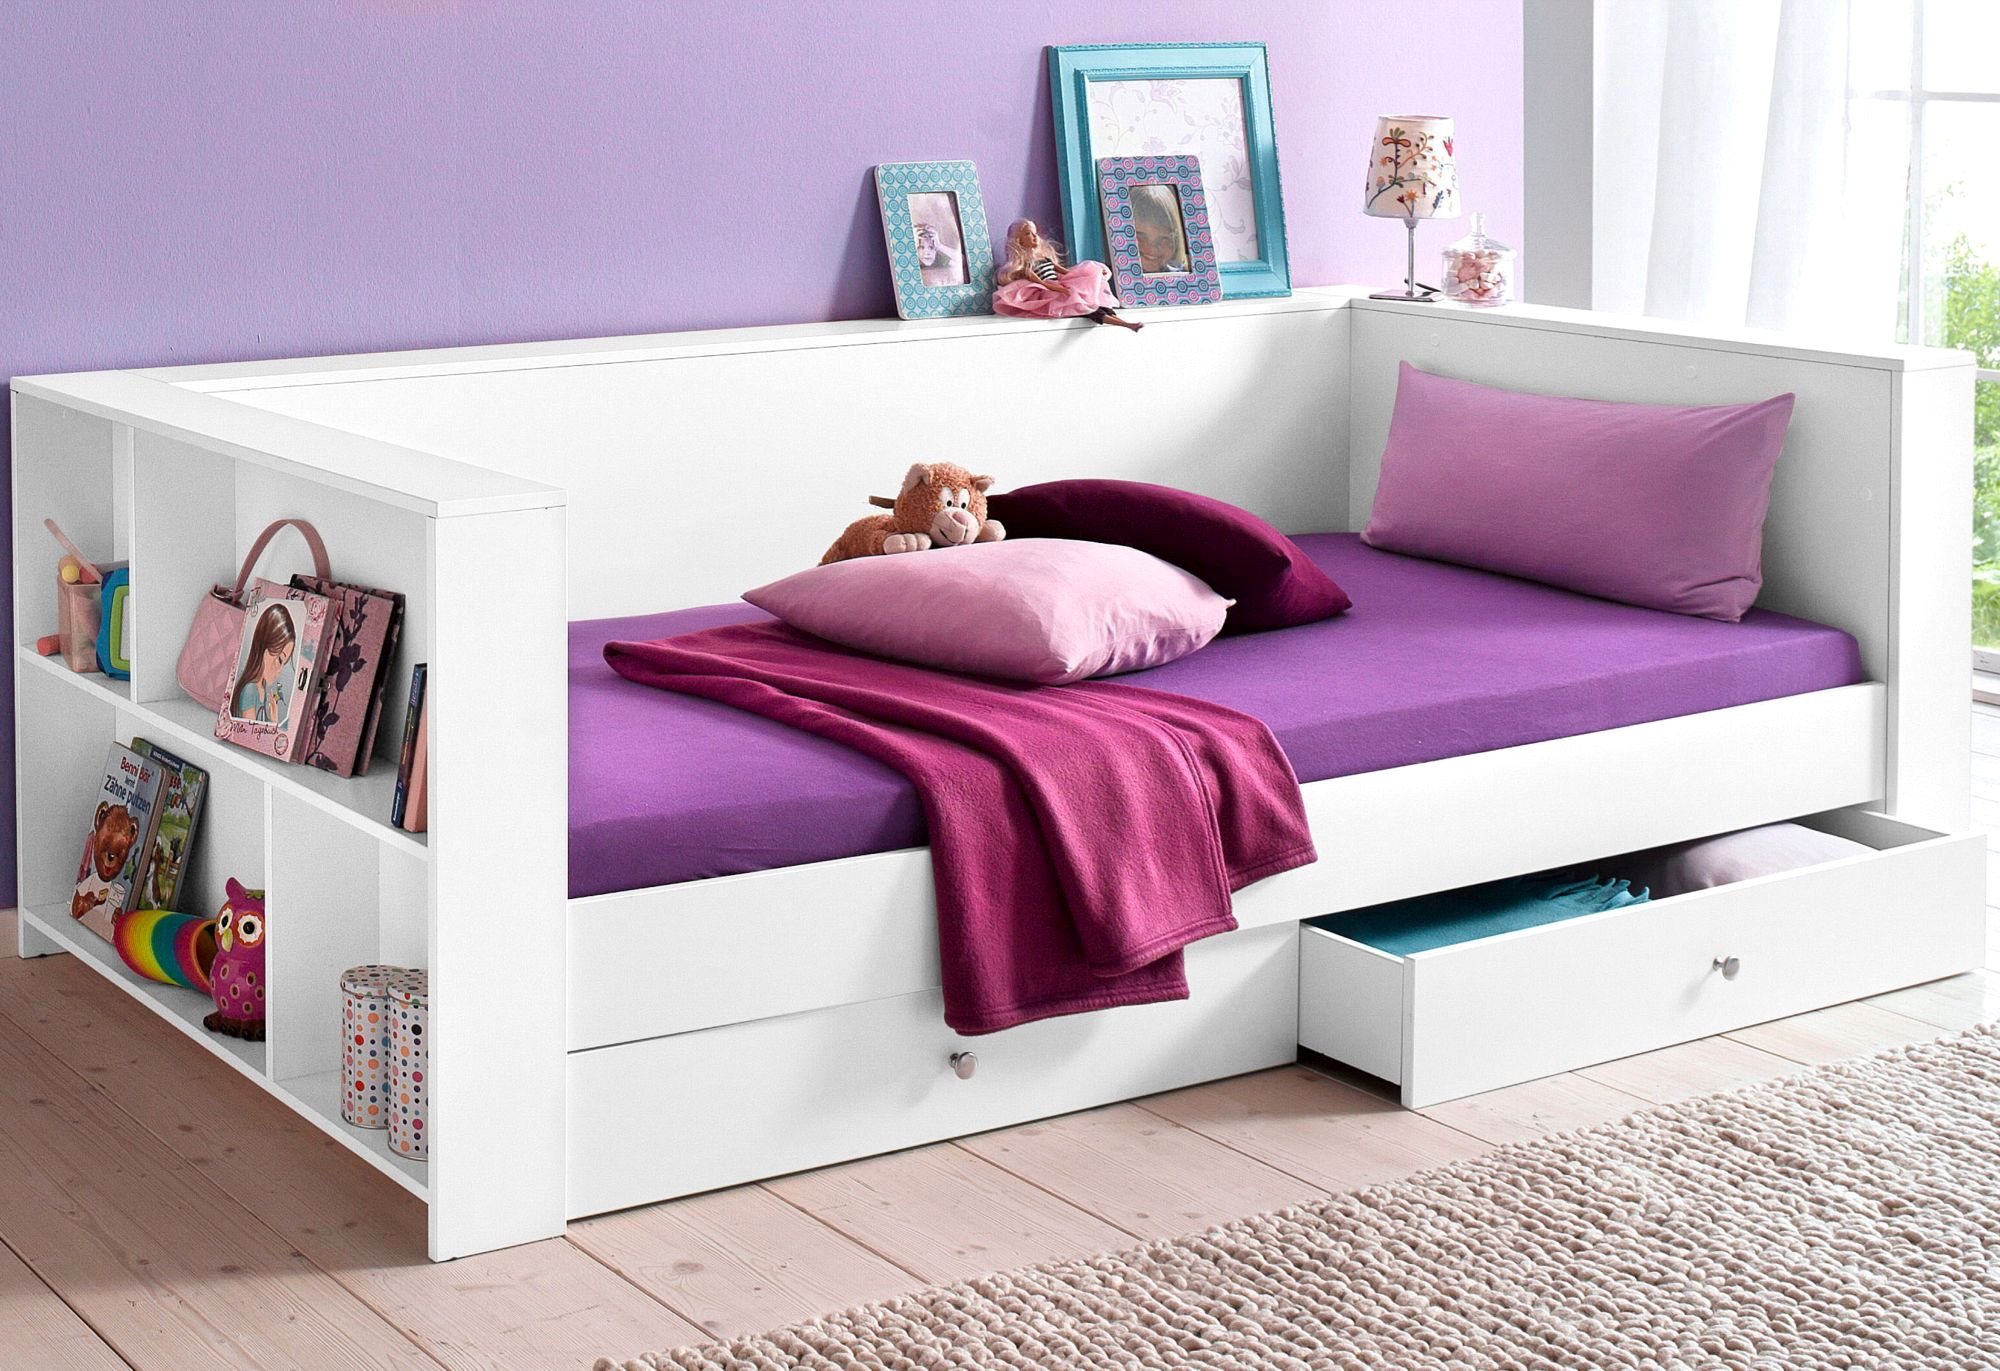 Full Size of Bett 120 Fabulous Pflegebett Mit Lift Komplett Cm With Weiß 120x200 King Size 140x200 Betten Günstig Kaufen 180x200 Bei Ikea 200x220 Aufbewahrung 100x200 Wohnzimmer Bett 1 20 Breit